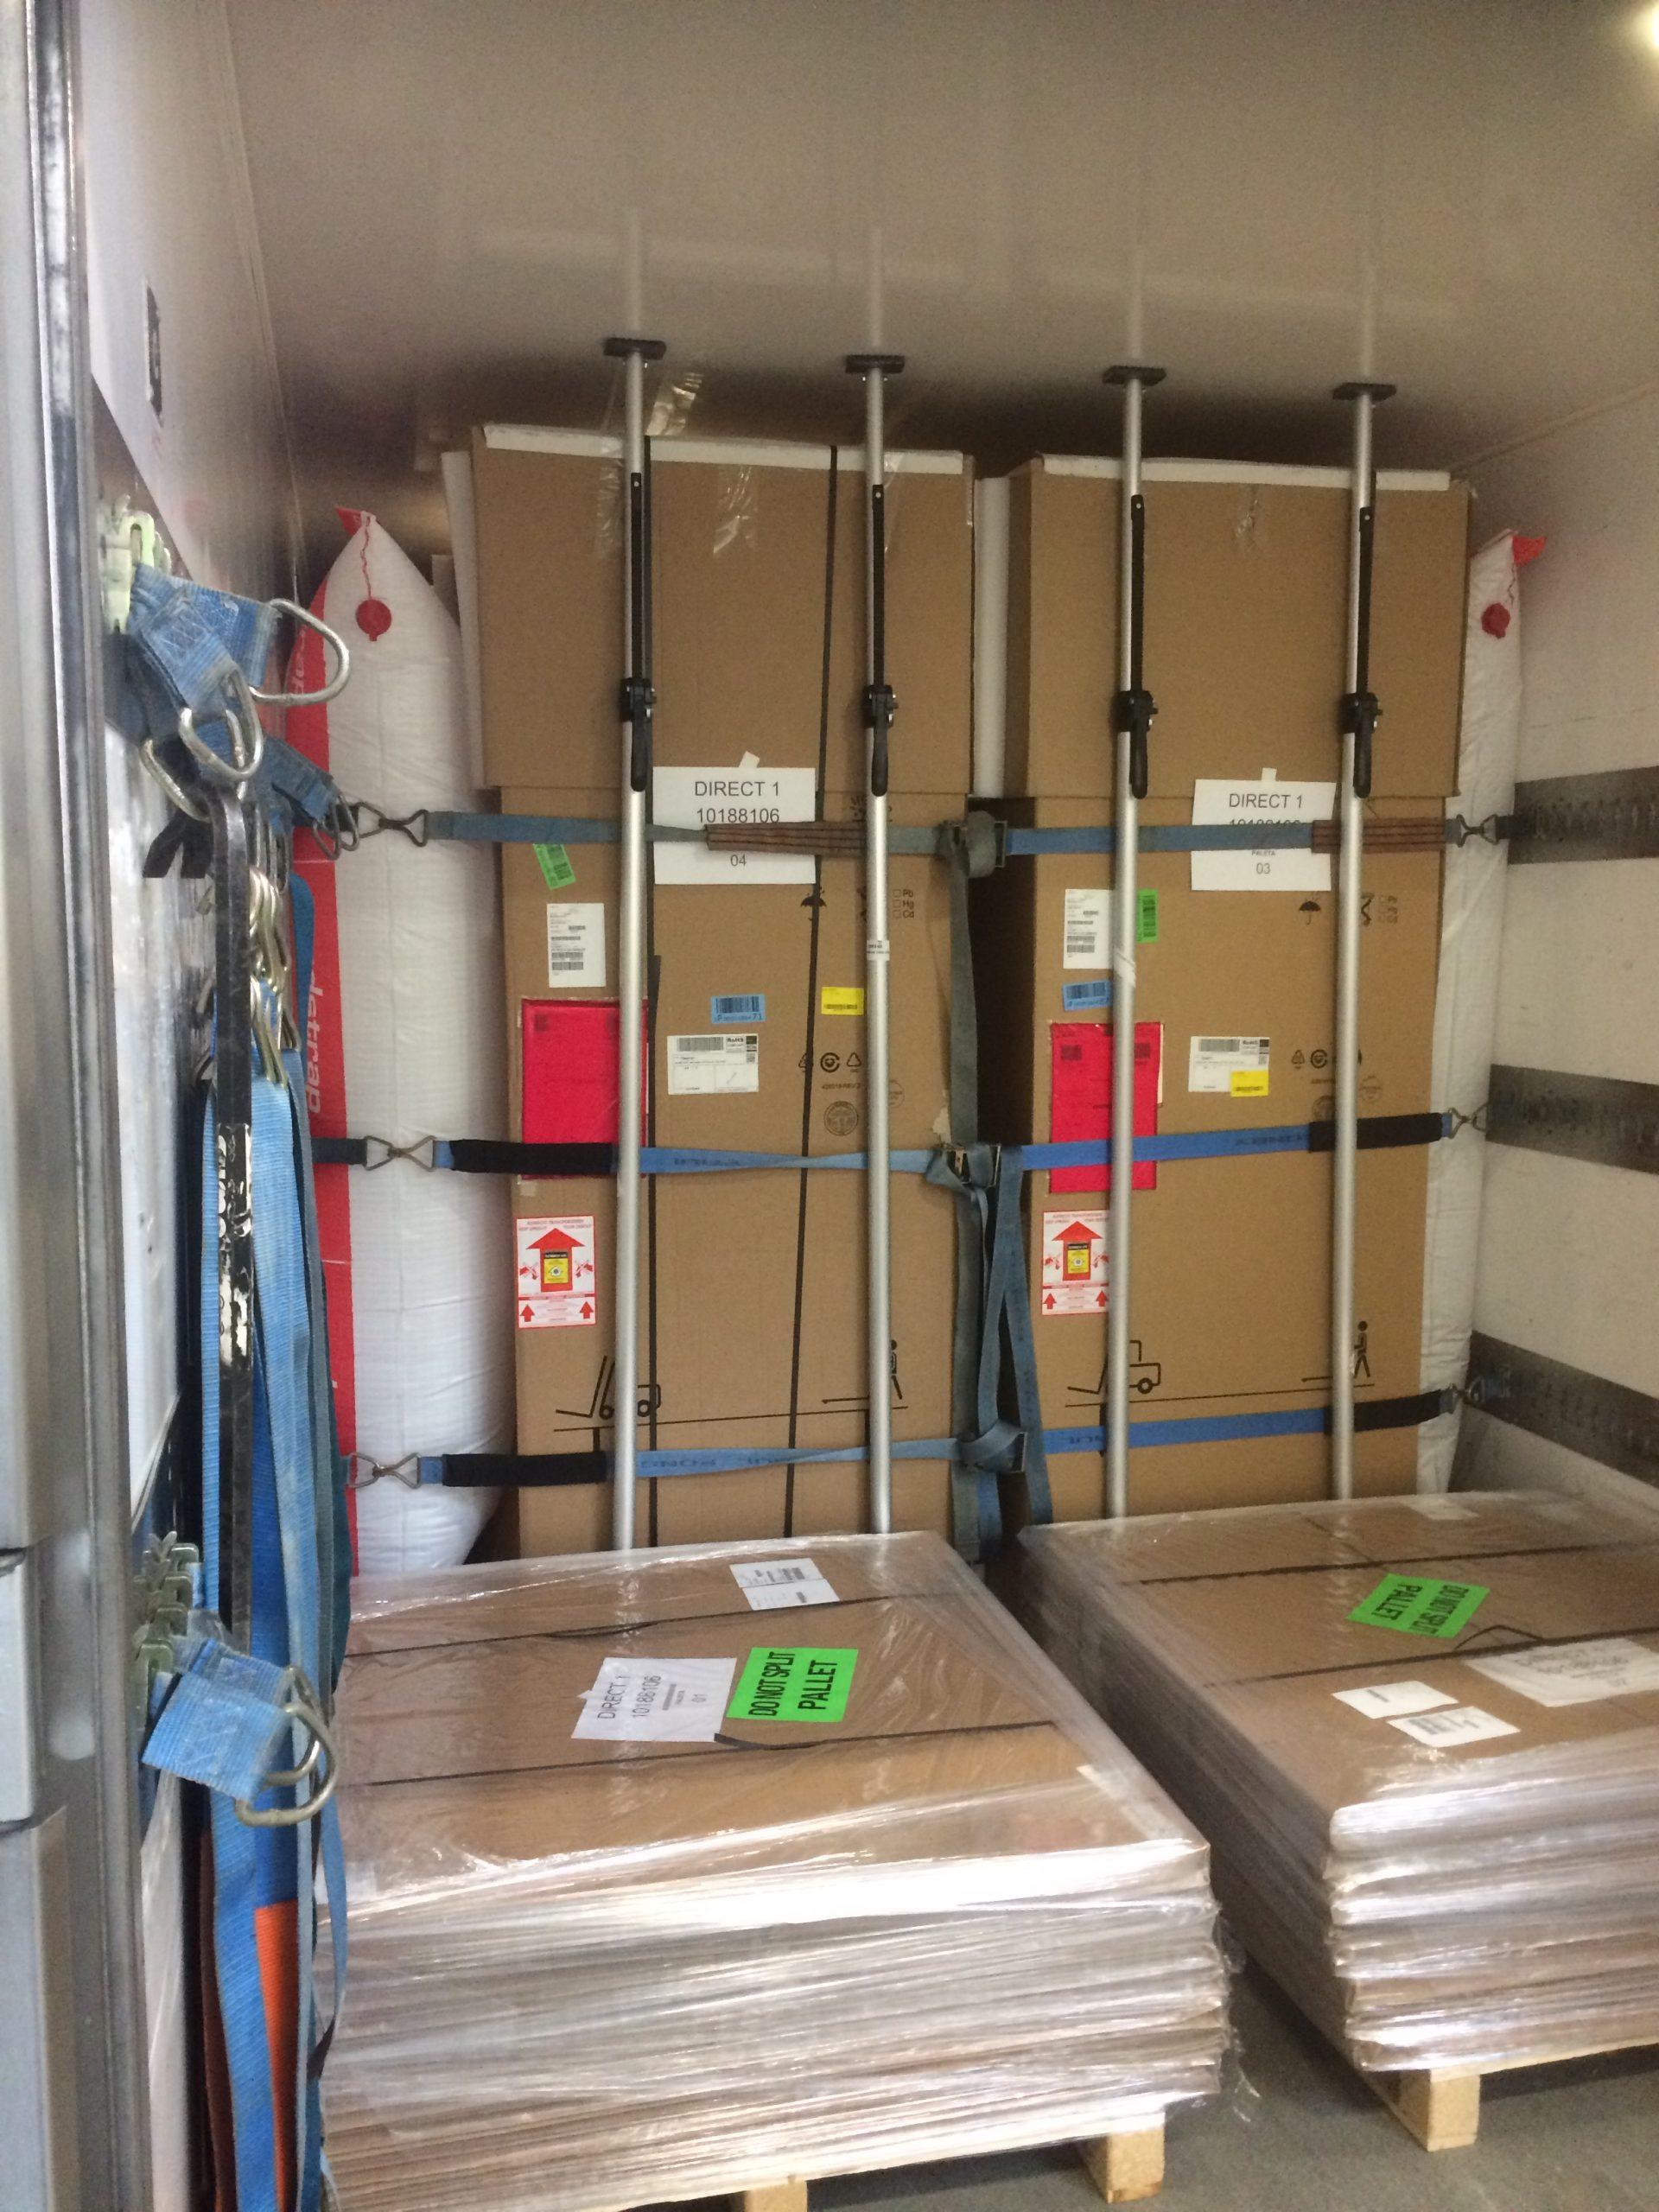 Goods-in-back-of-truck-scaled.jpg